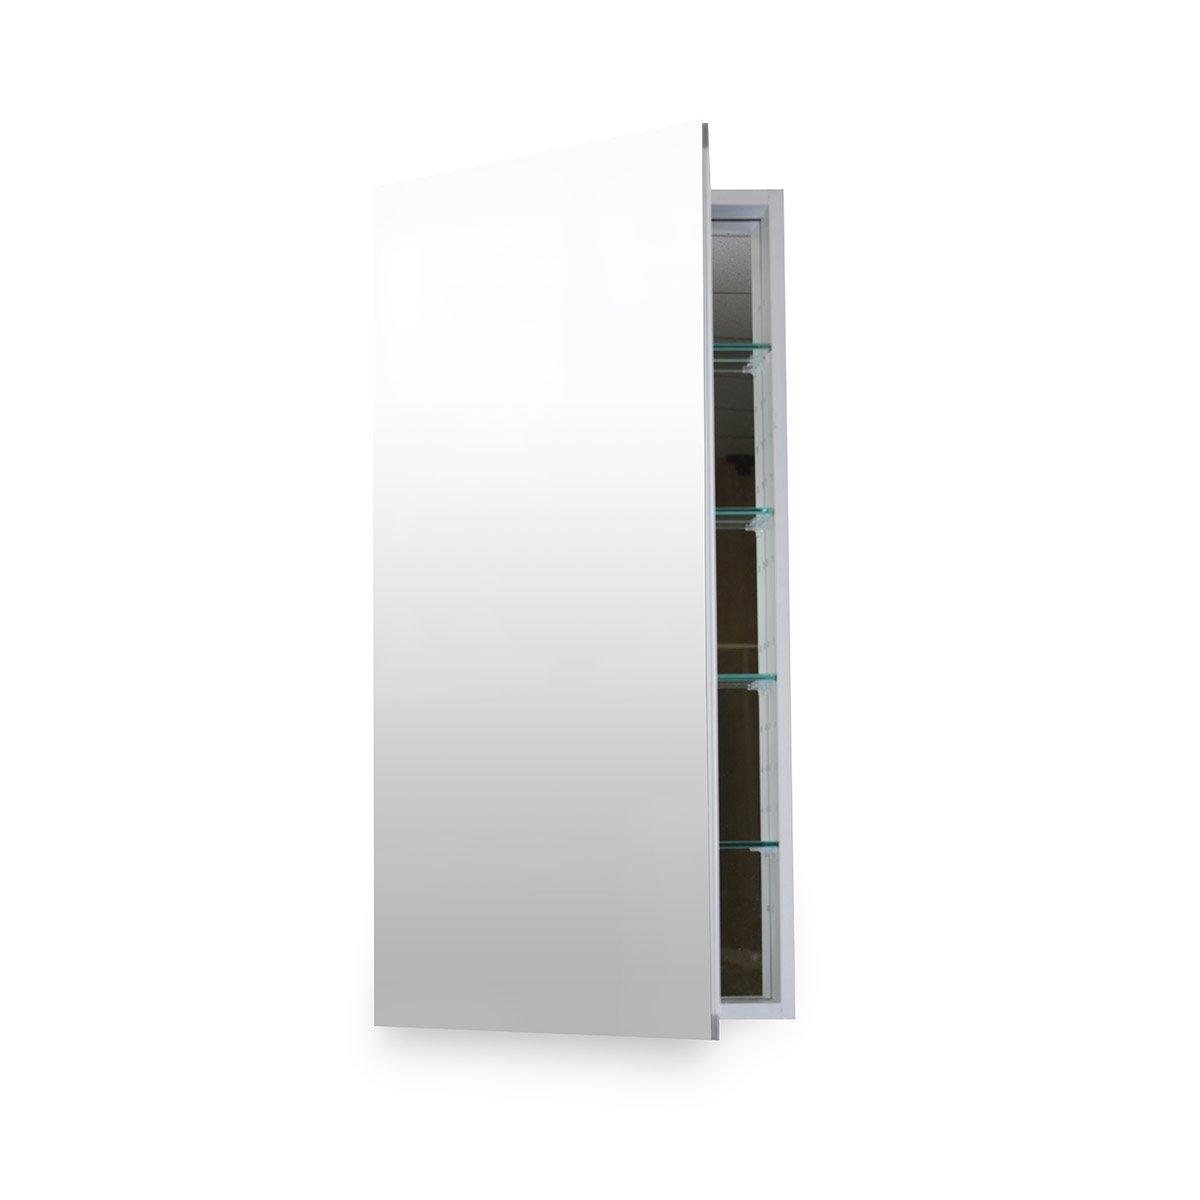 Flawless Bathroom MC 1236 Medicine Cabinet with Blum Soft Close Door Hinges, 12 x 36'', Anodized Aluminum